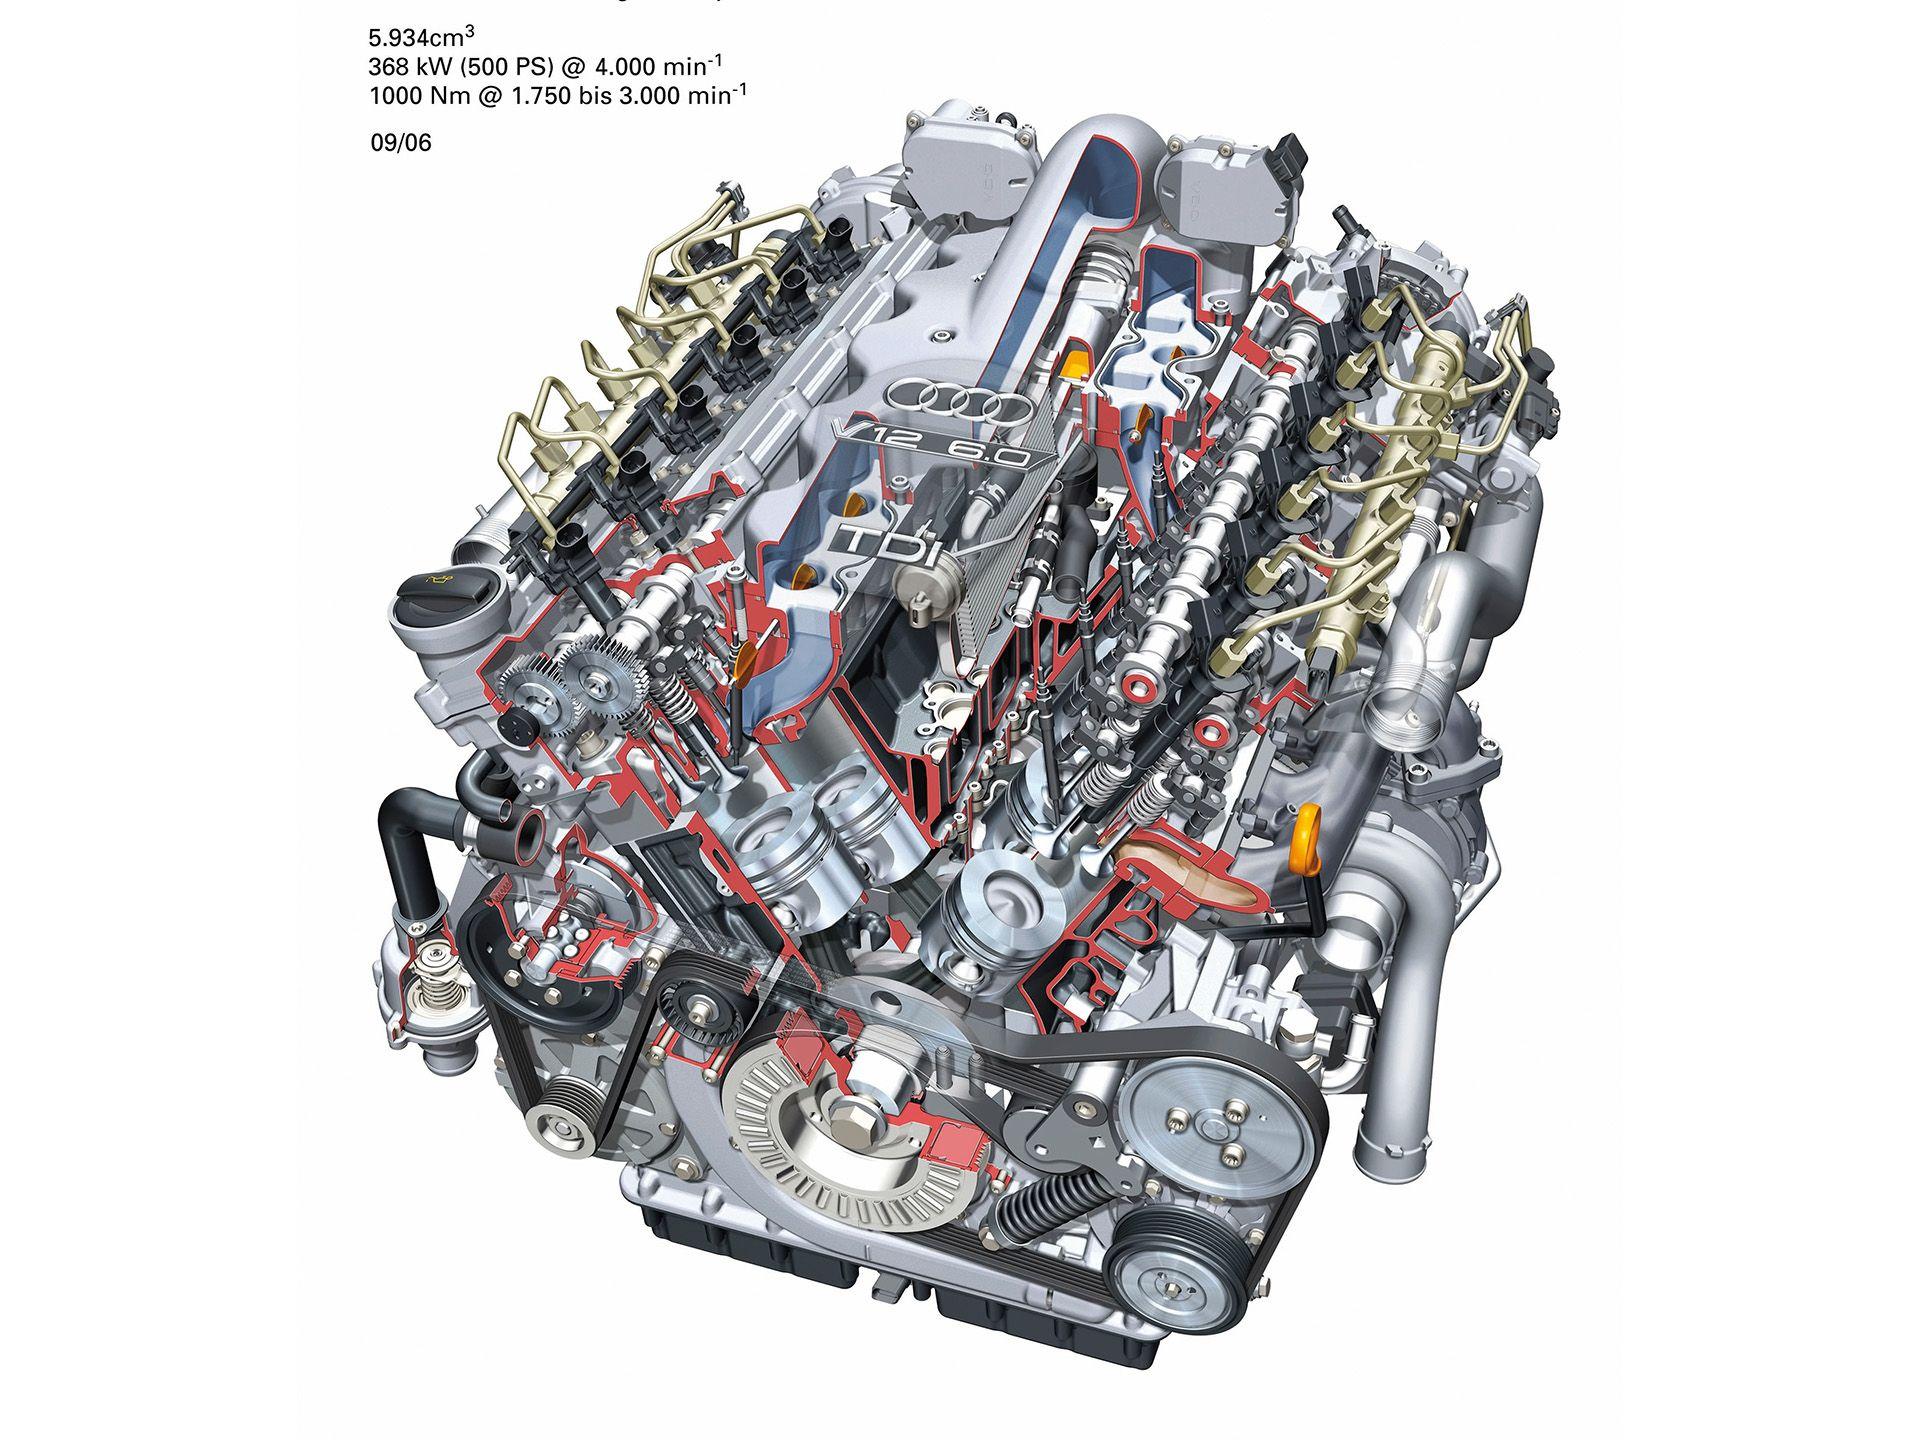 Inner Workings Of The Insane 6 0 V12 Tdi Really Cool Audi